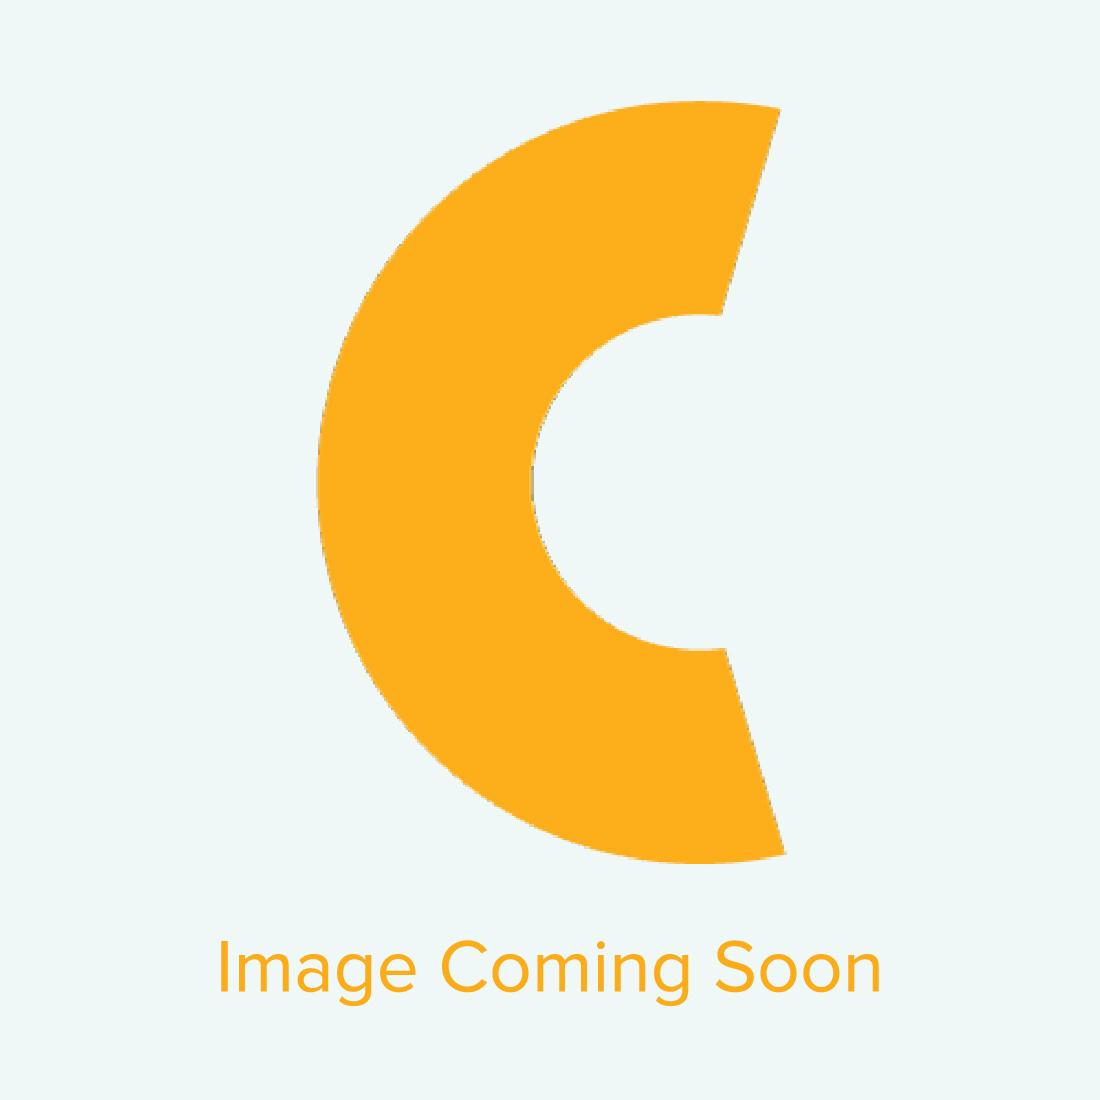 "7"" Round Platen for Hotronix, MAXX and STX Heat Press Machines"